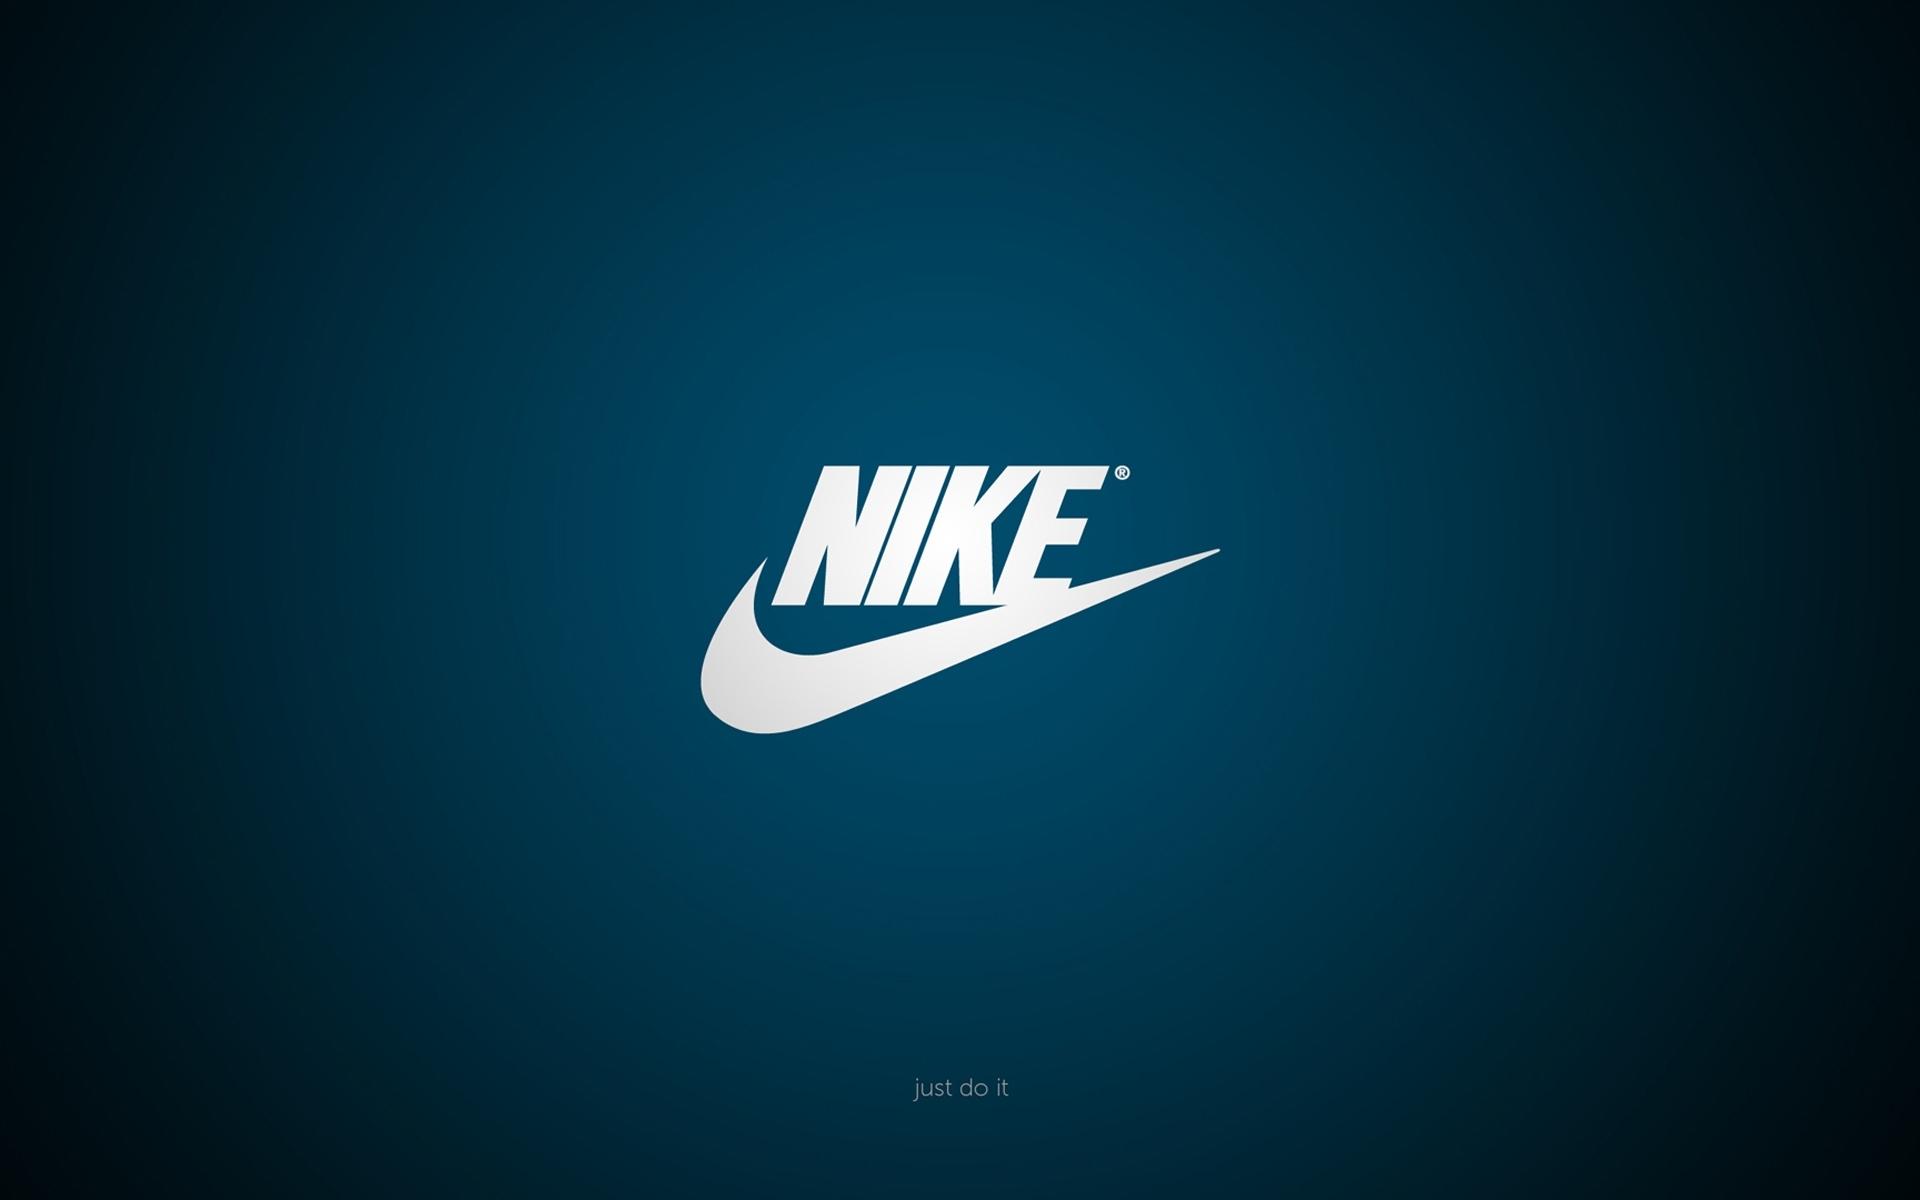 Картинки Nike, логотип, спорт, надпись, минимализм фото и обои на рабочий стол